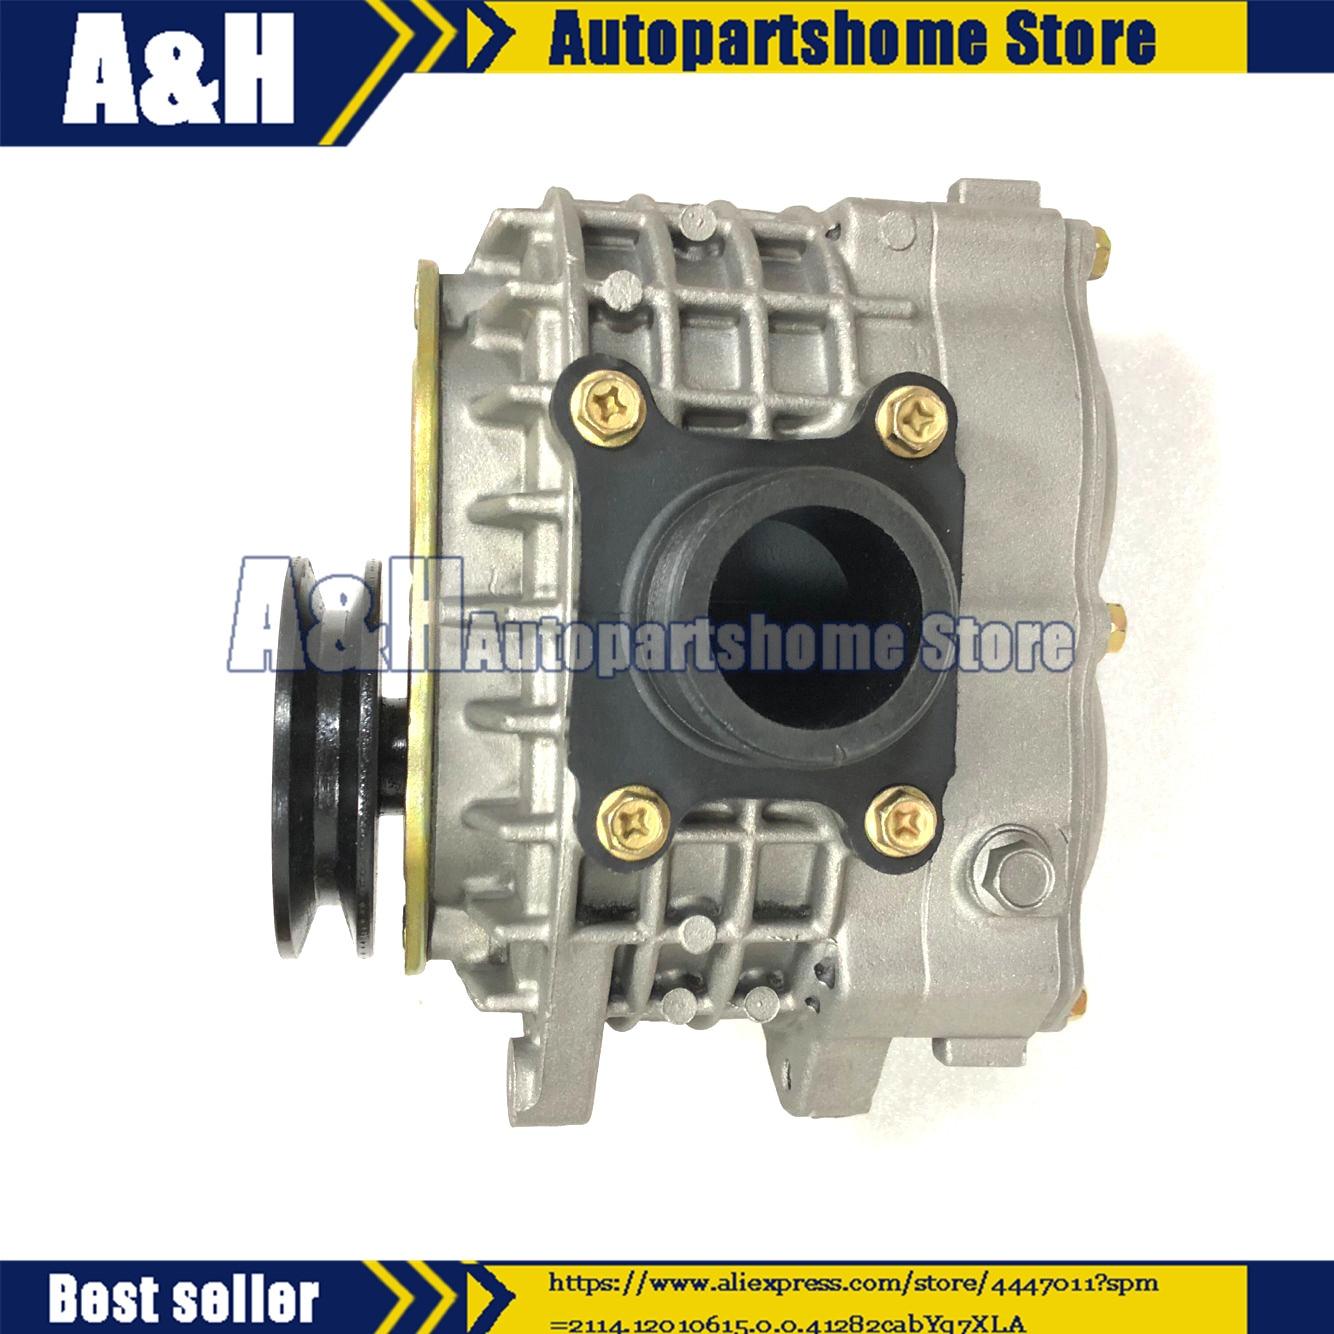 Remanufactured AMR500 For Auto Roots Supercharger Compressor Blower Booster Mechanical Turbocharger Kompressor Turbine 1.0-2.2L